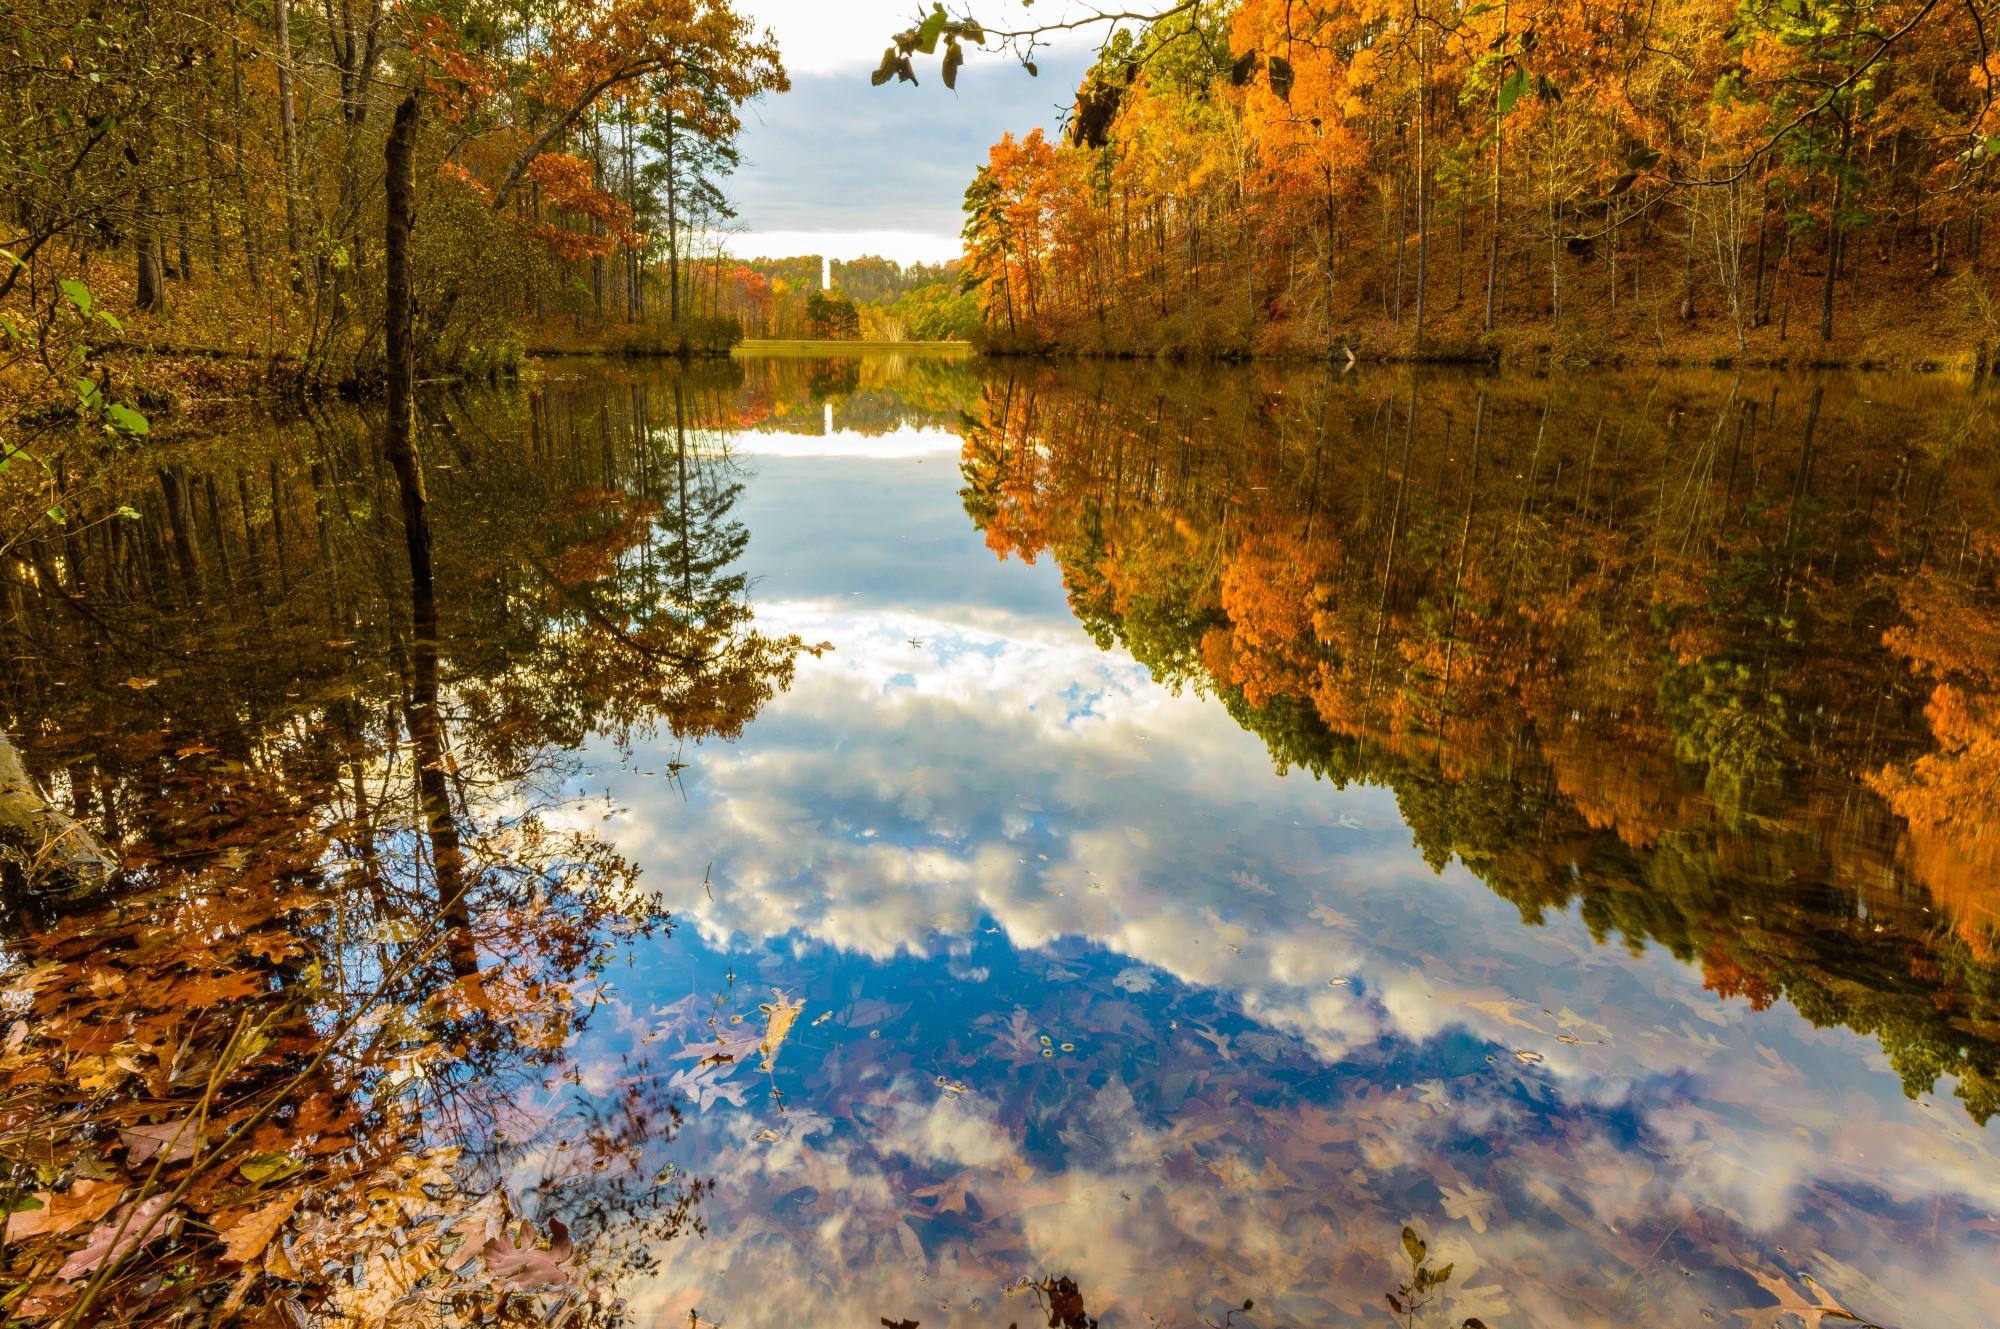 Oak Mountain State Park